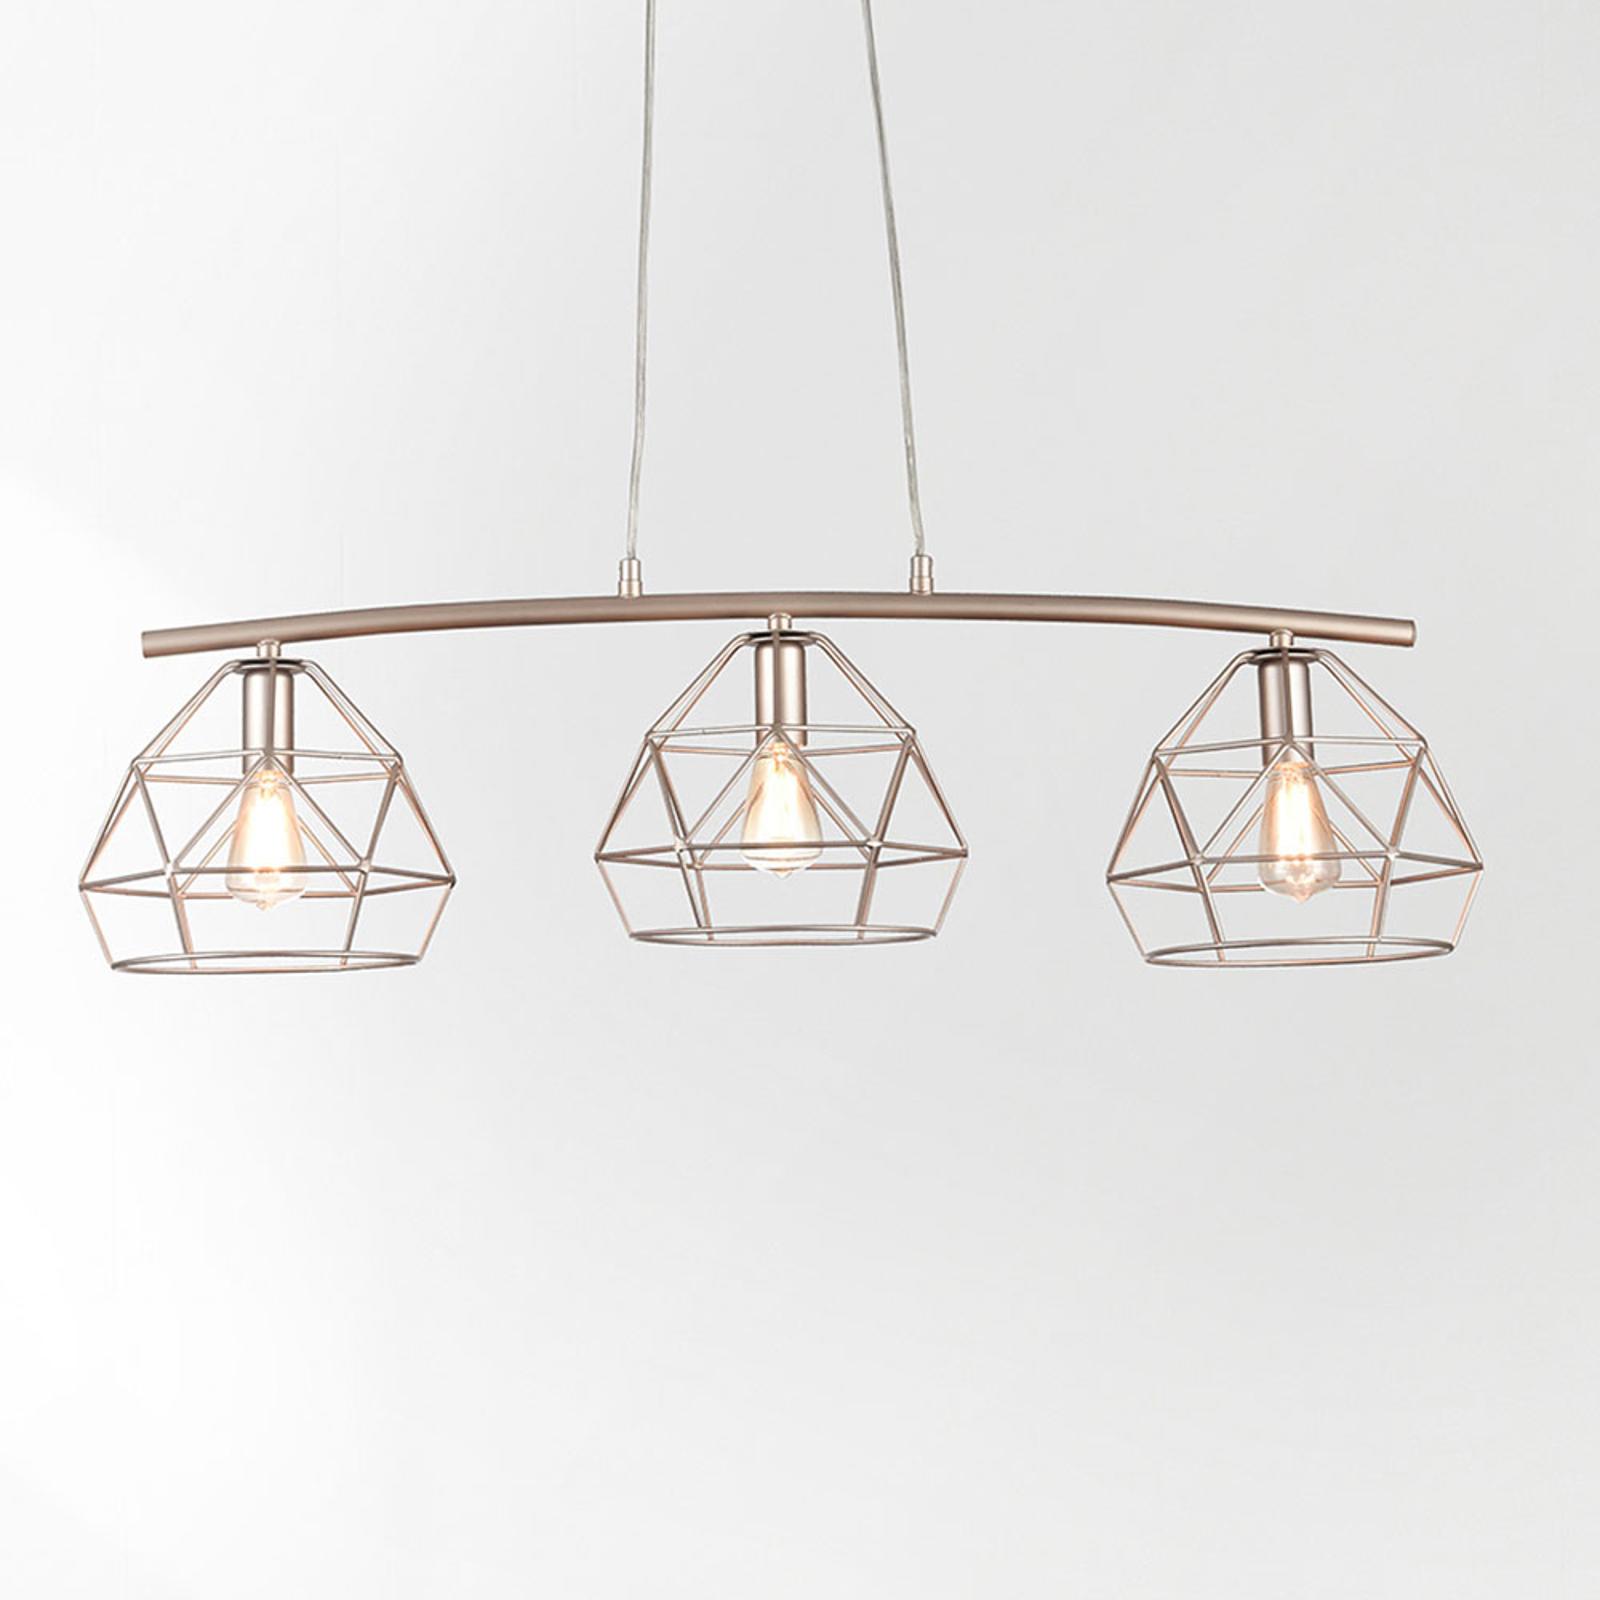 Hanglamp Soprano, 3-lamps